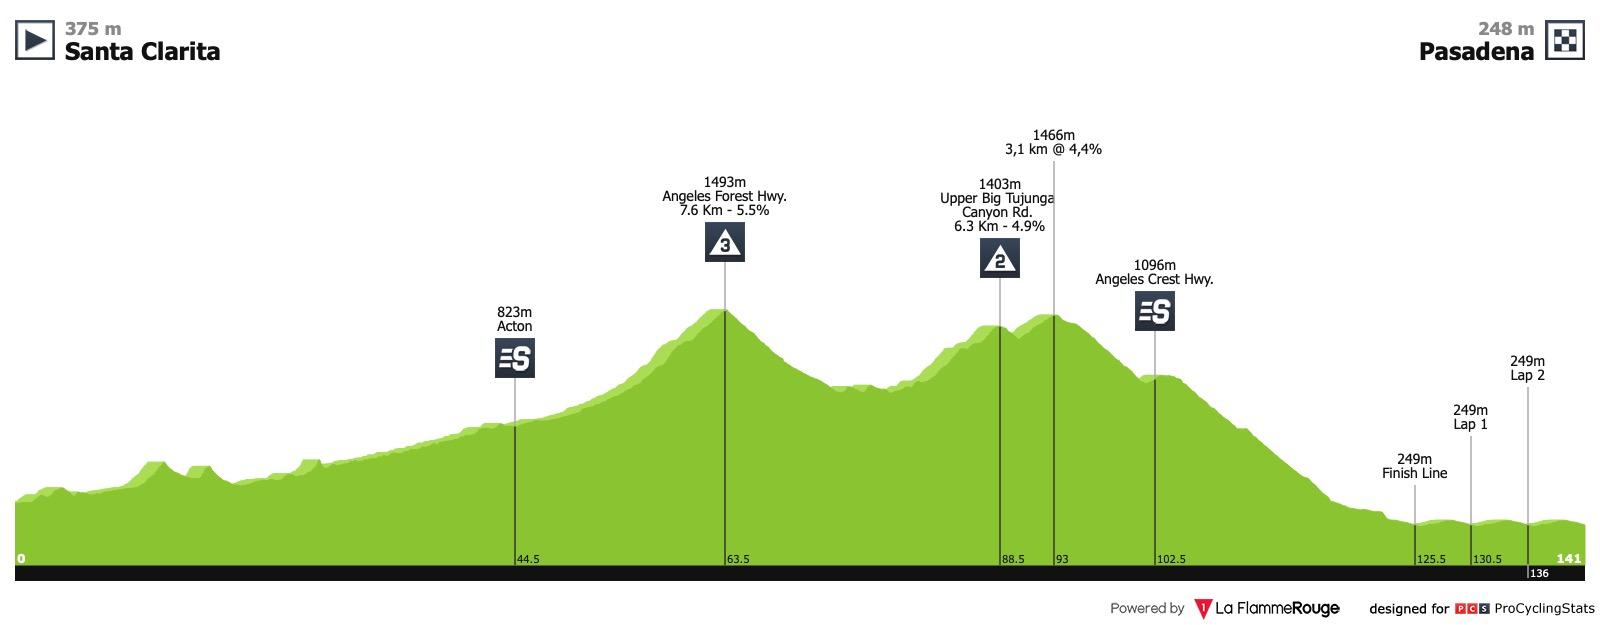 Amgen Tour of California 2019 Tour-of-california-2019-stage-7-profile-975275ef5f